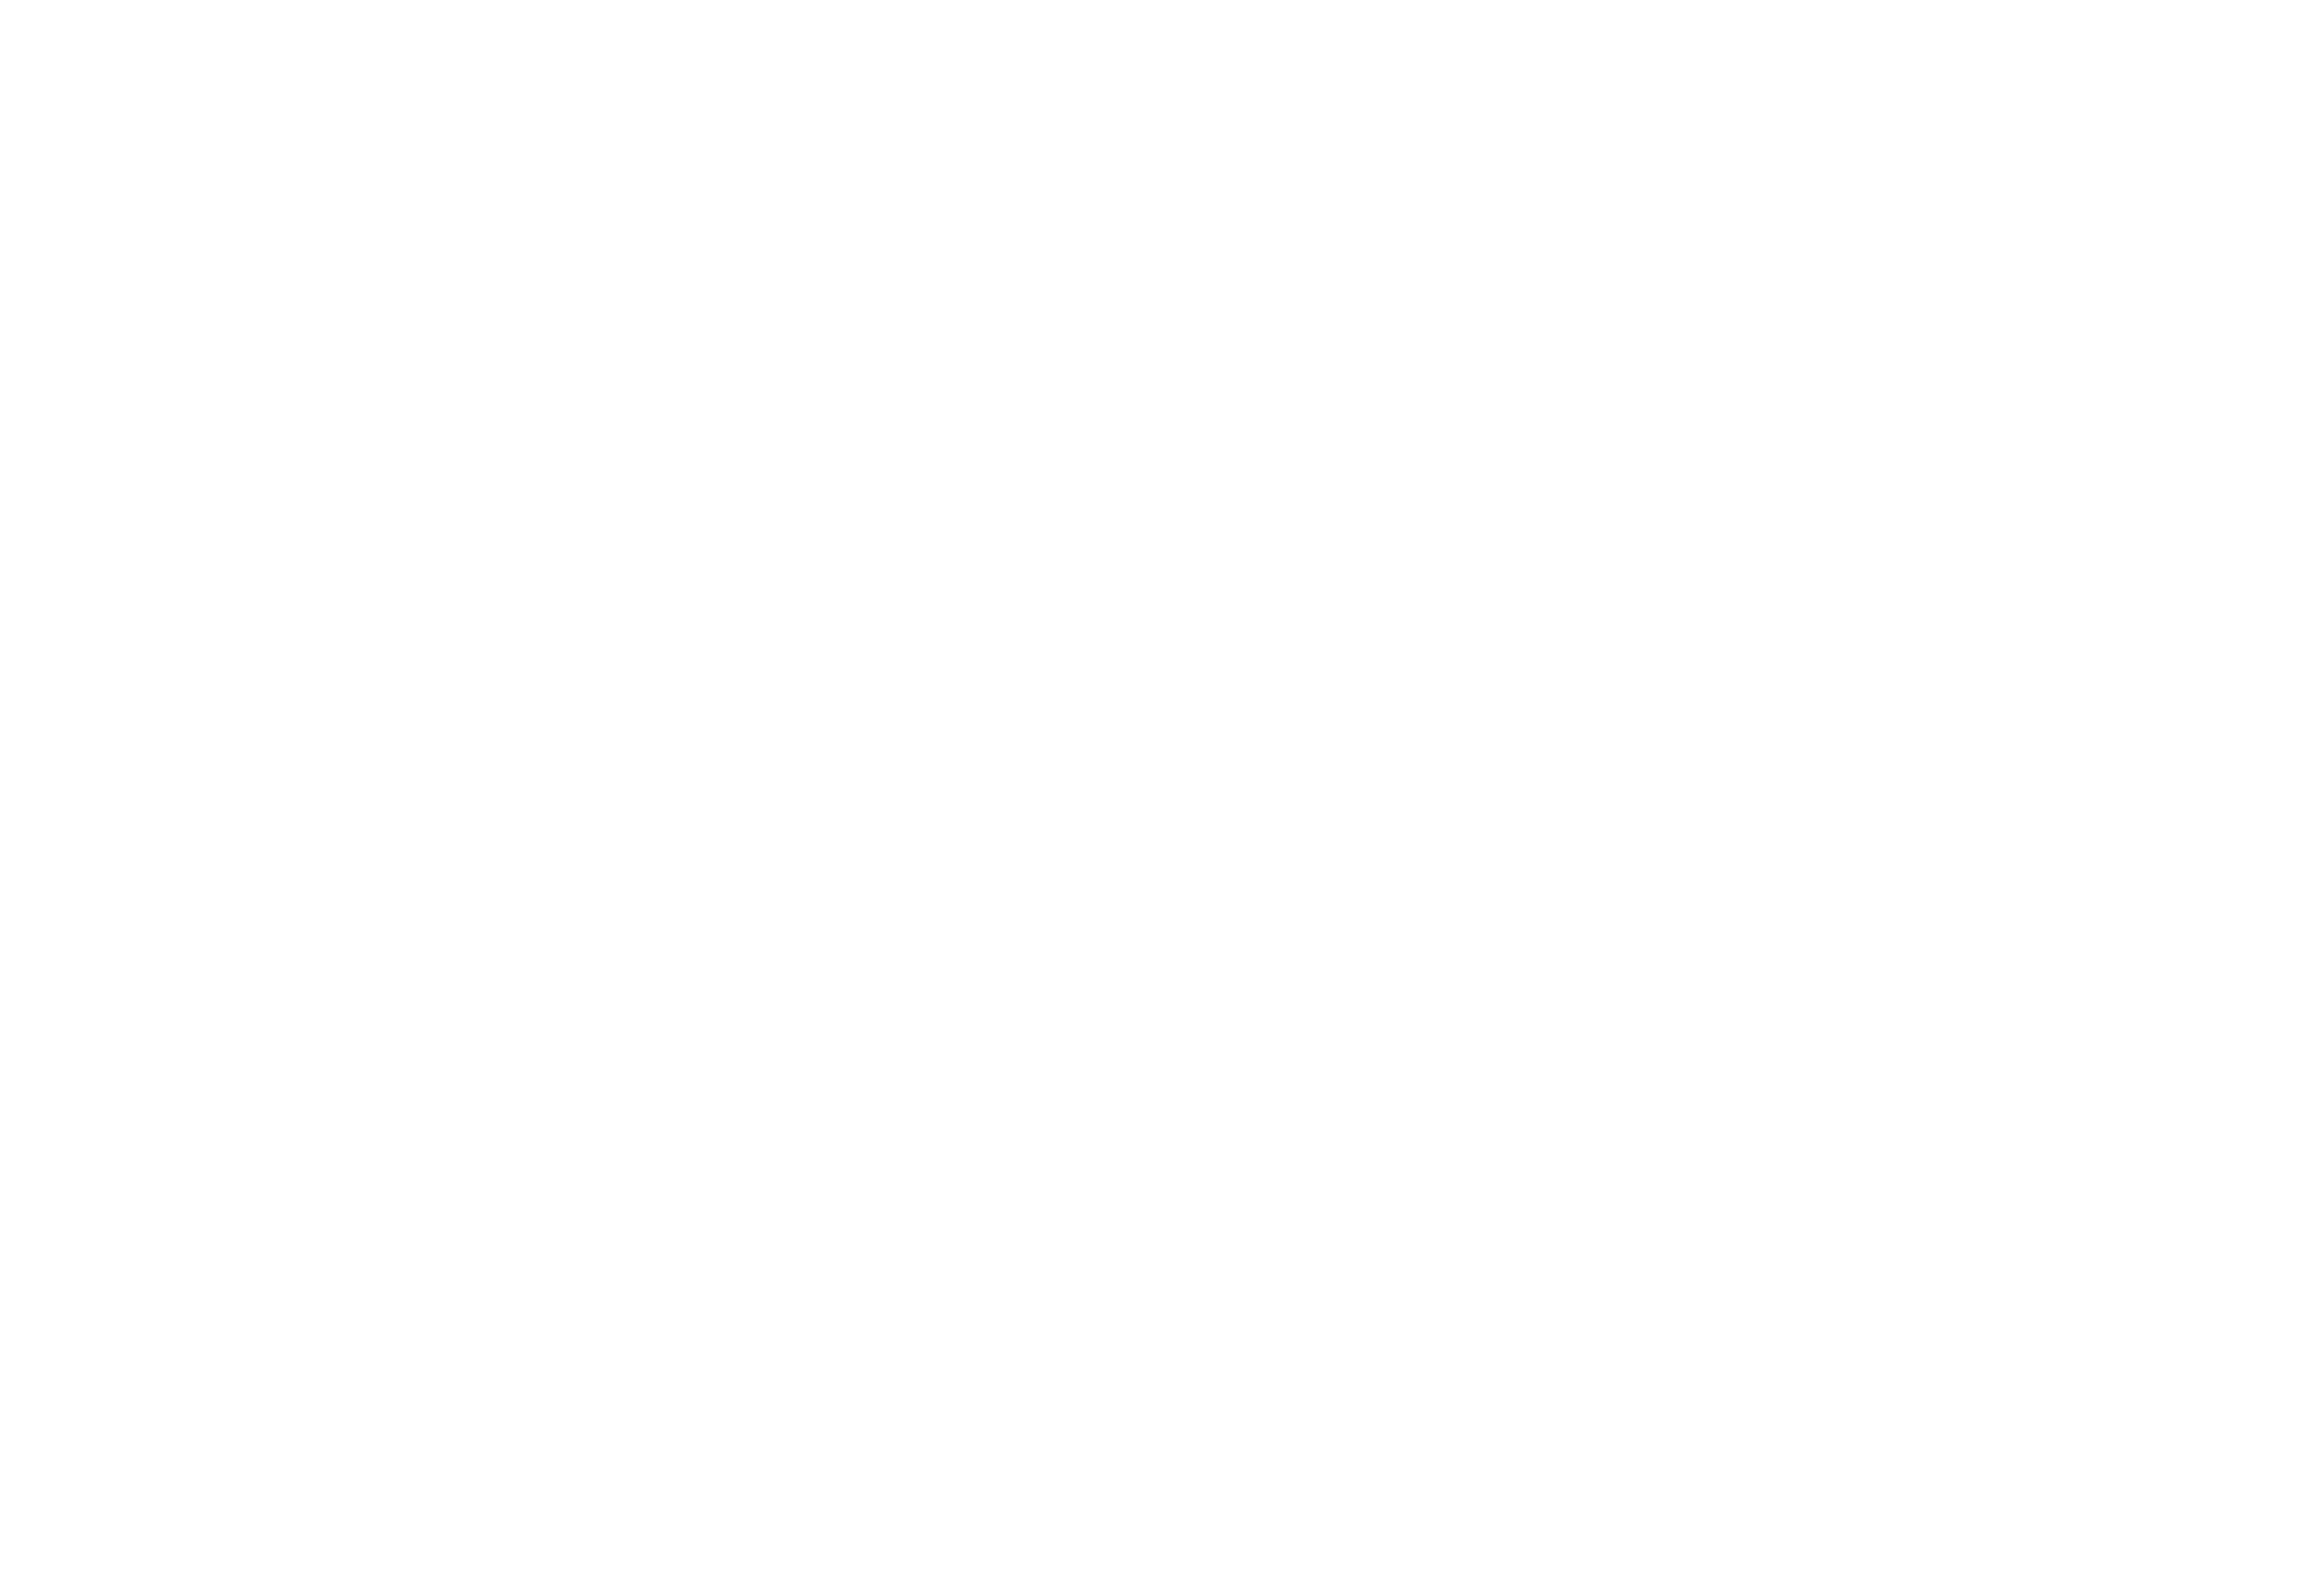 Dogwood Handcrafts